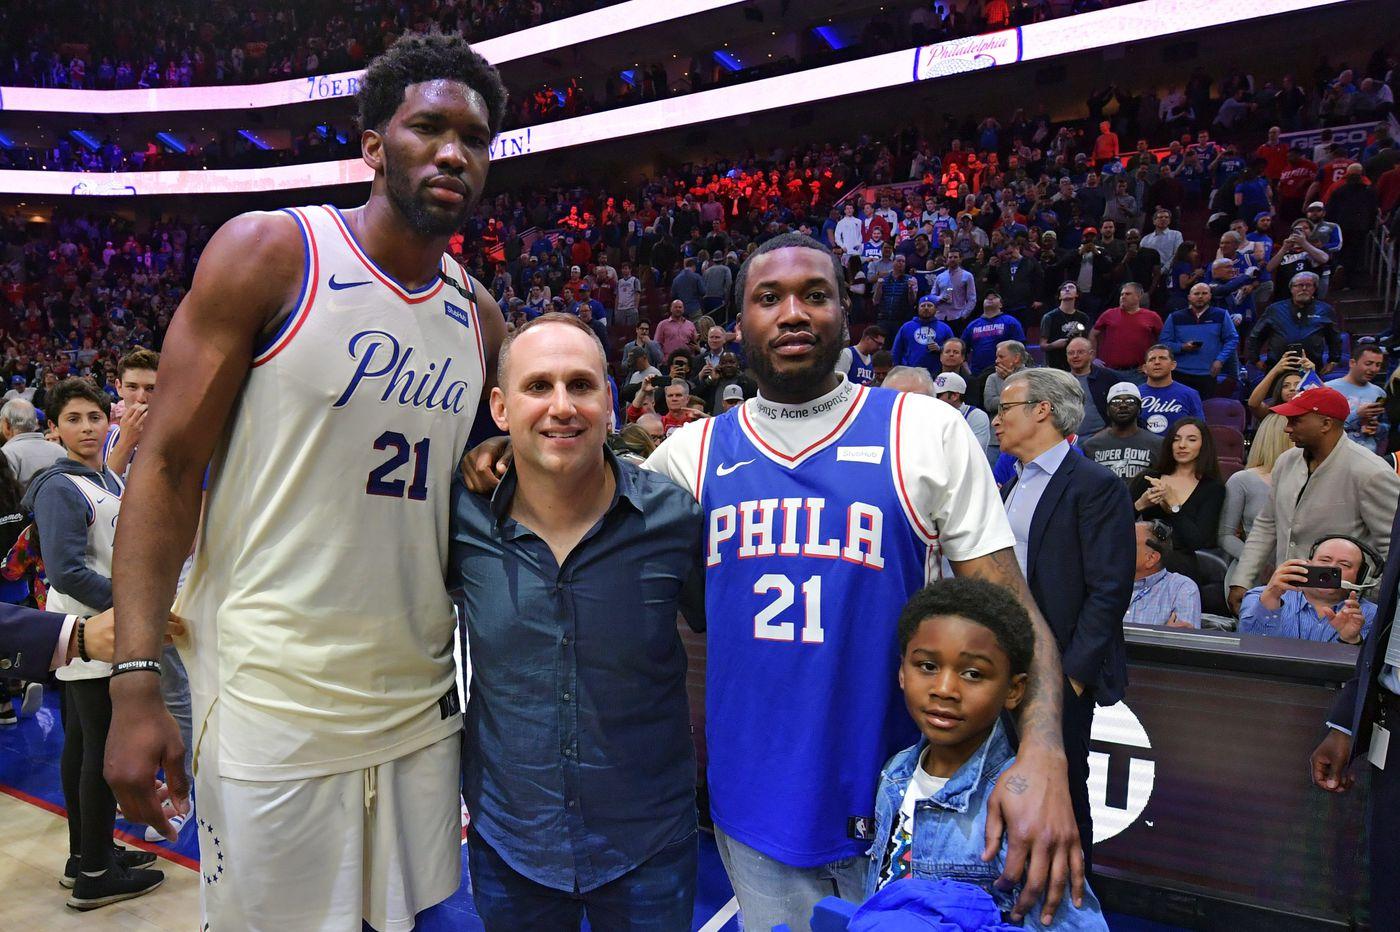 Weekend rewind: 76ers partner Michael Rubin gets Drake shoutout, Colin Kaepernick attends LSU game, Deontay Wilder talks Tyson Fury rematch